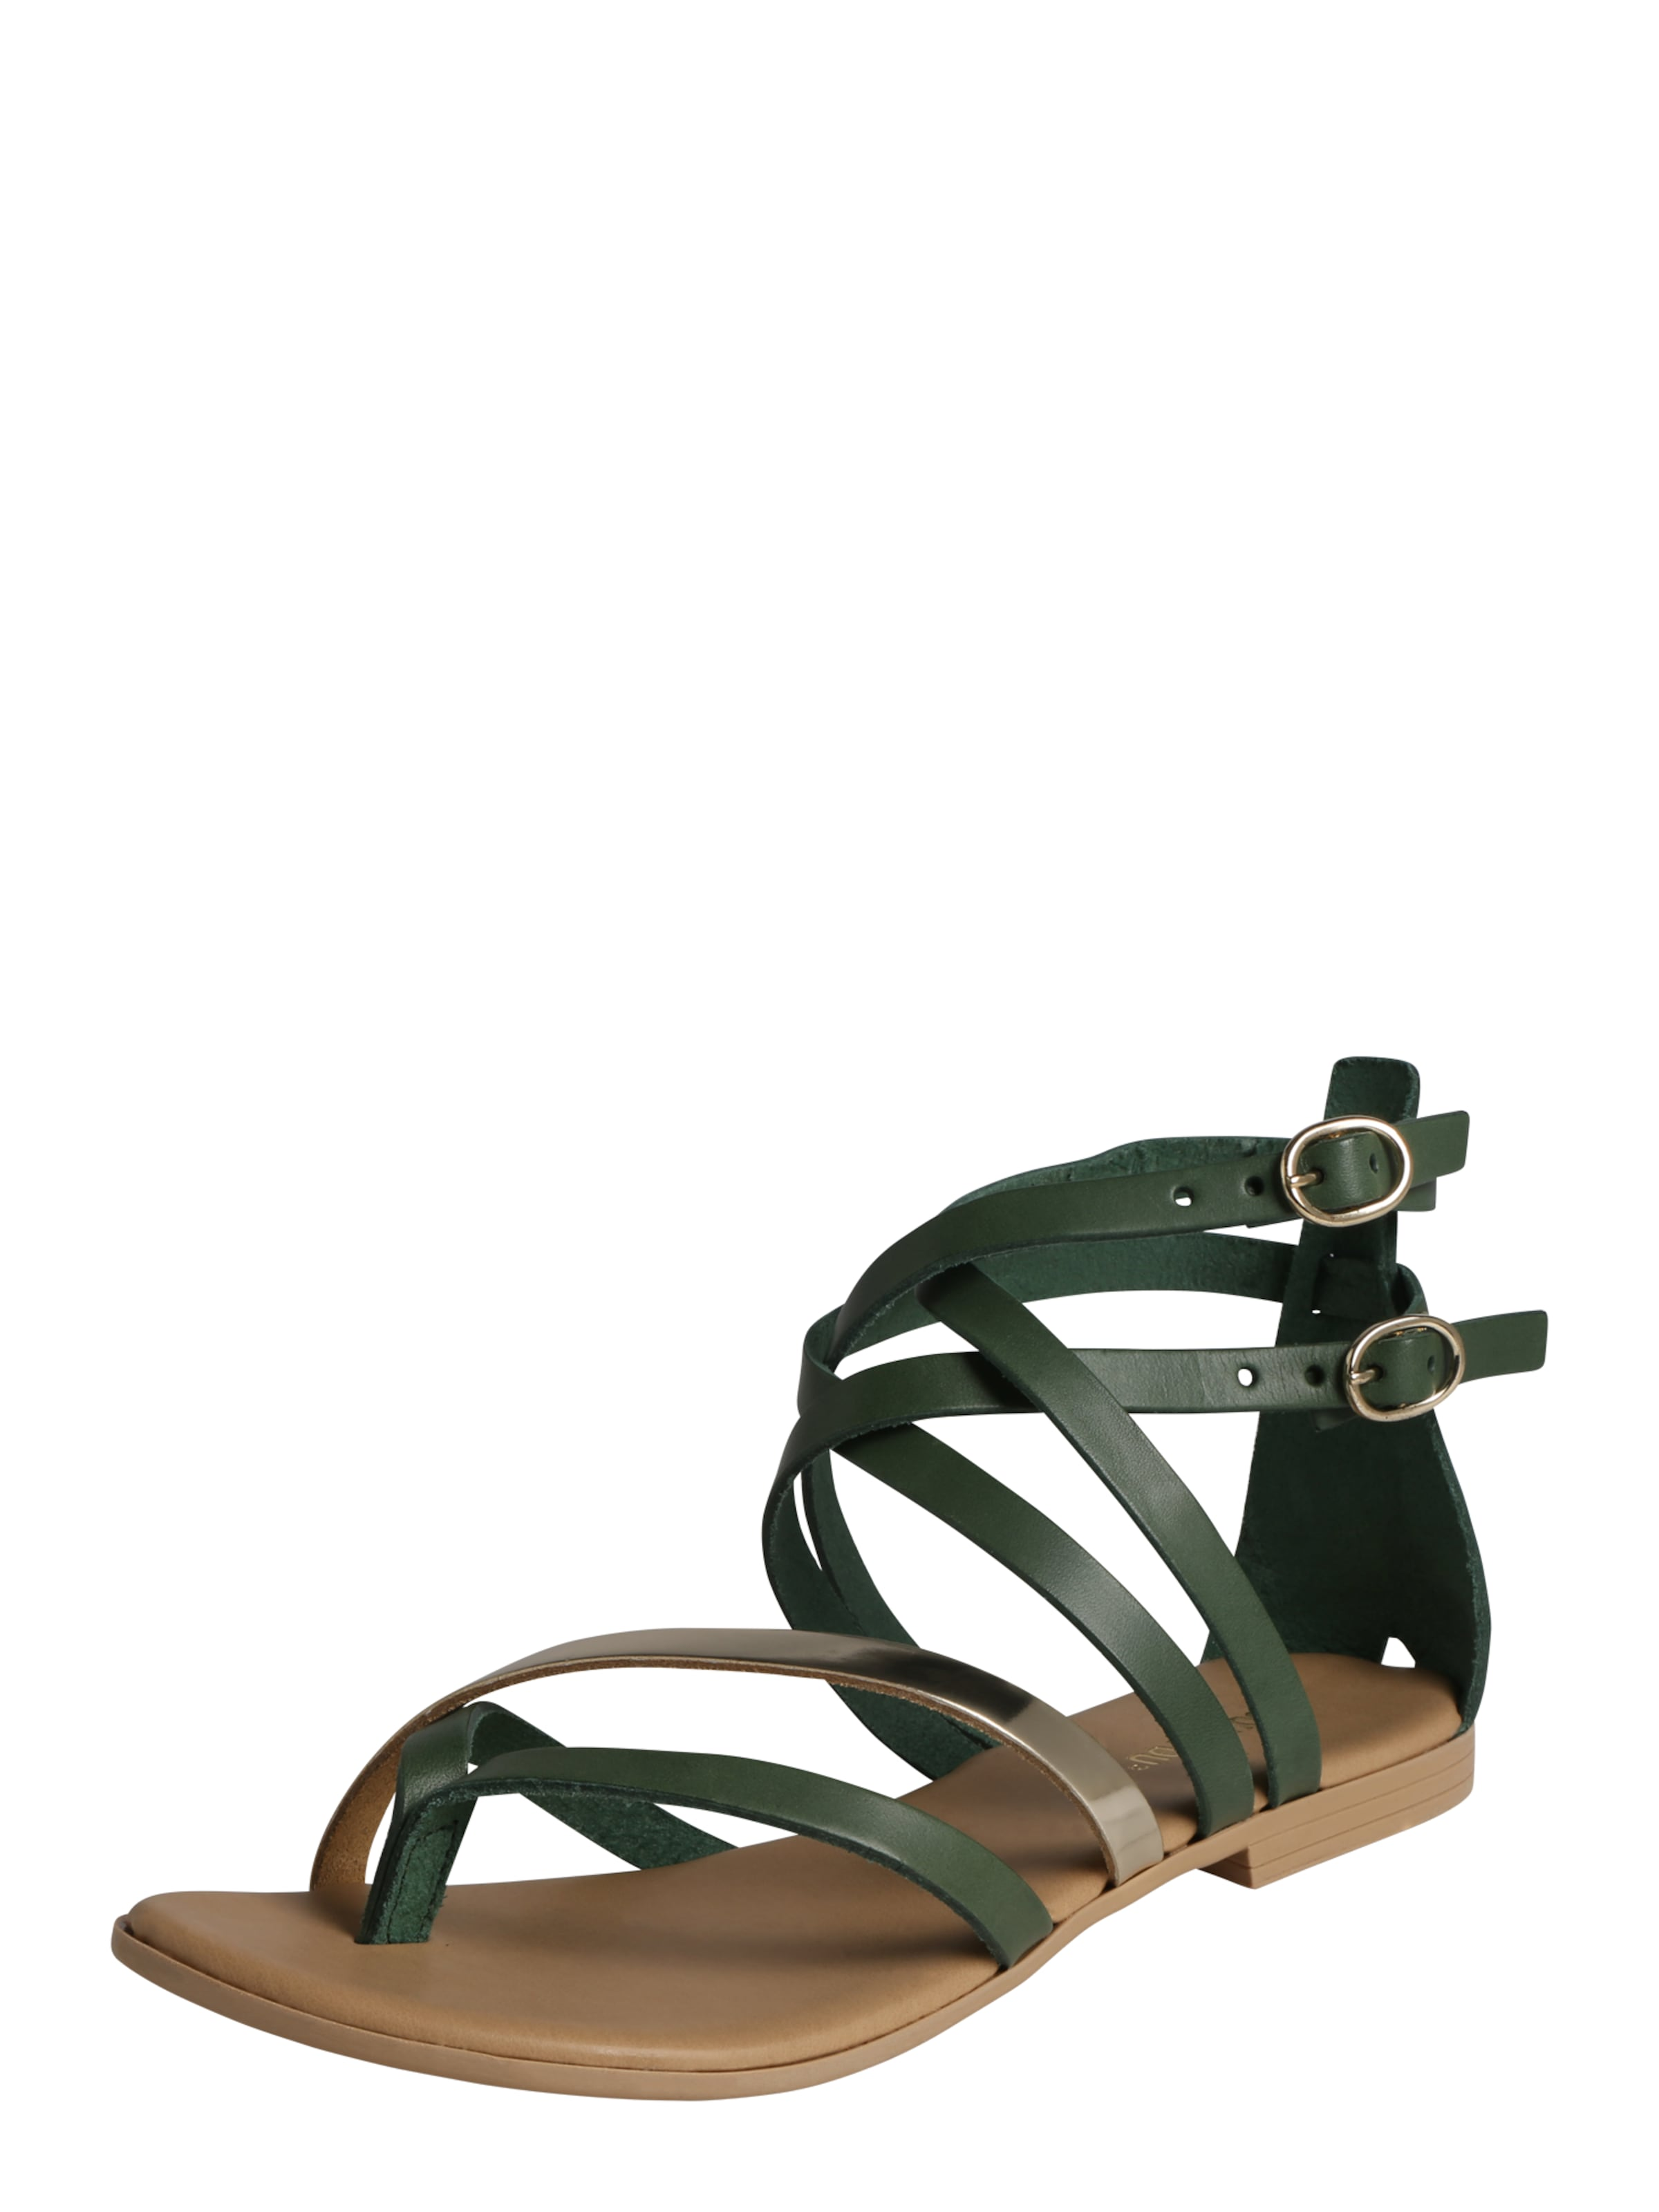 Haltbare Mode billige Schuhe Zehentrennersandale 'SUSANNA' Schuhe Gut getragene Schuhe